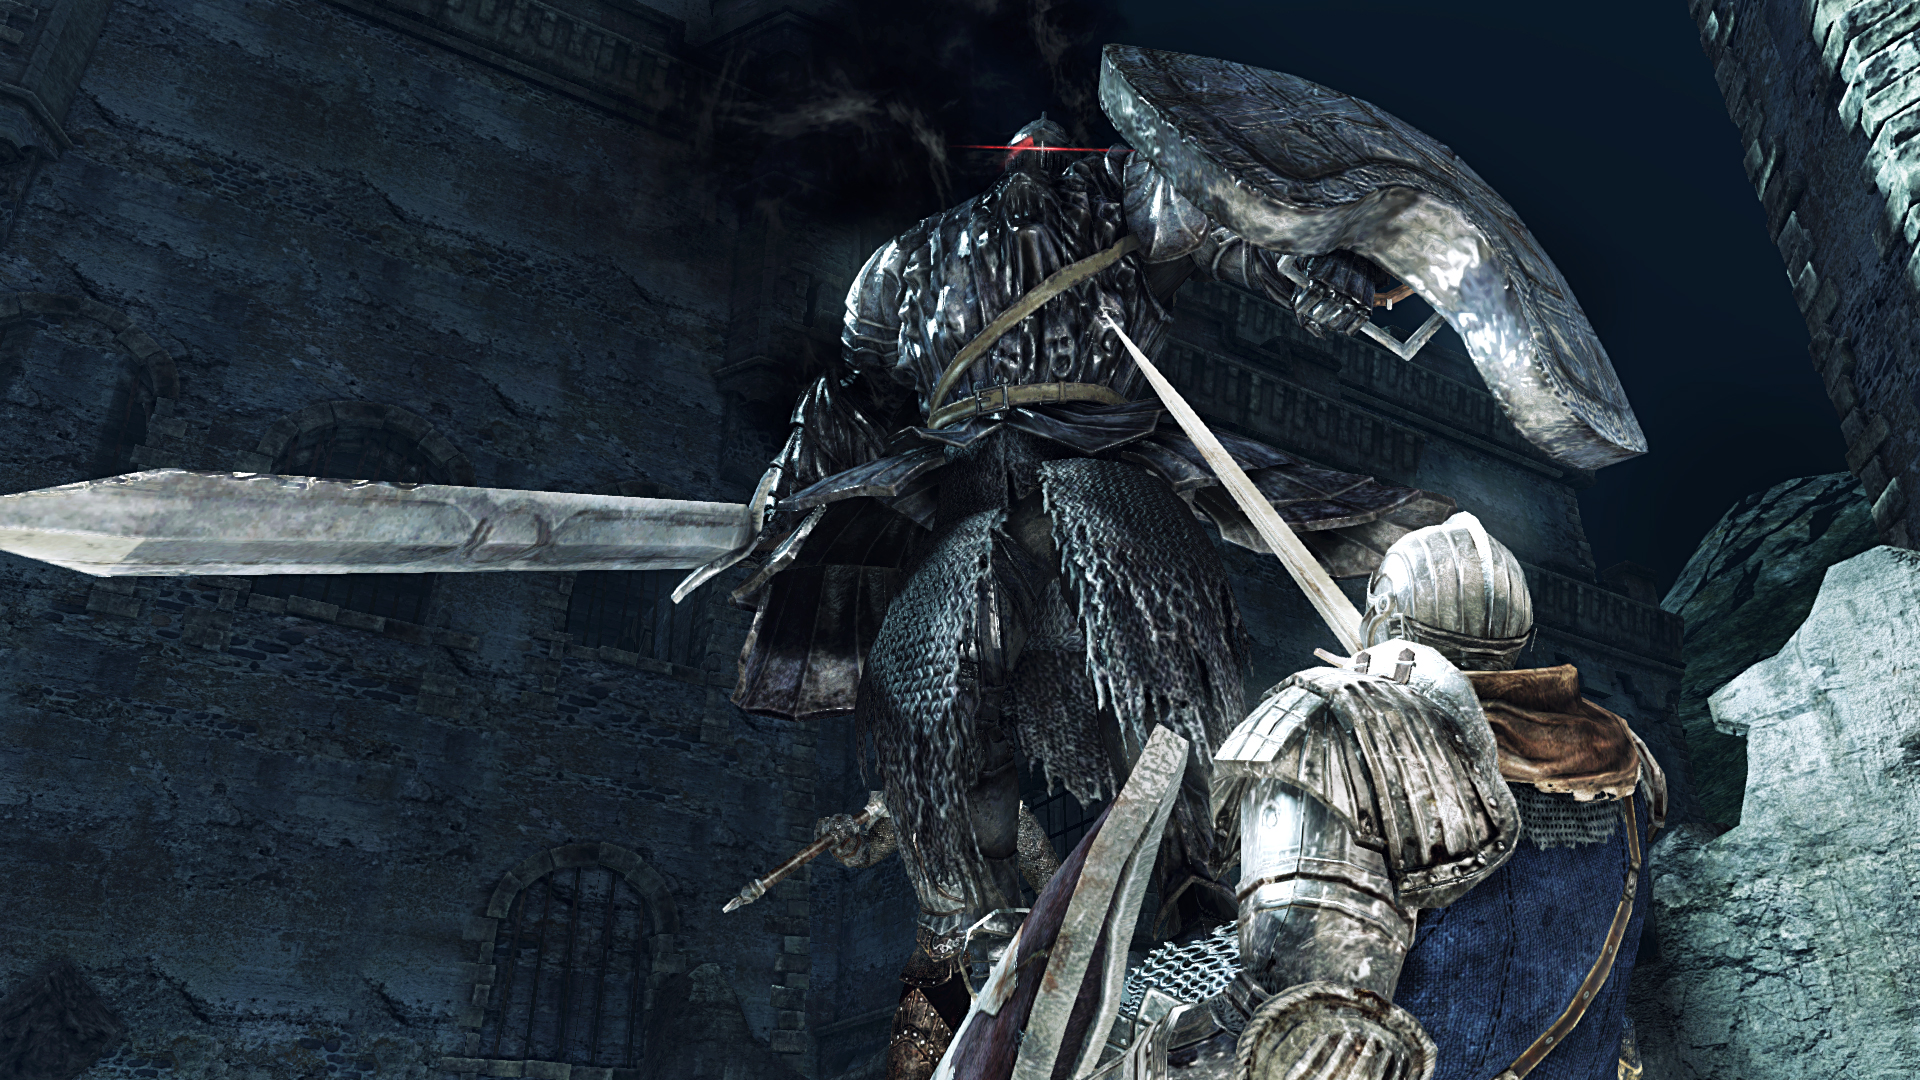 Obrazem: Temné dungeony, kostlivci a monstra z Dark Souls 2: Scholar of the First Sin 107550